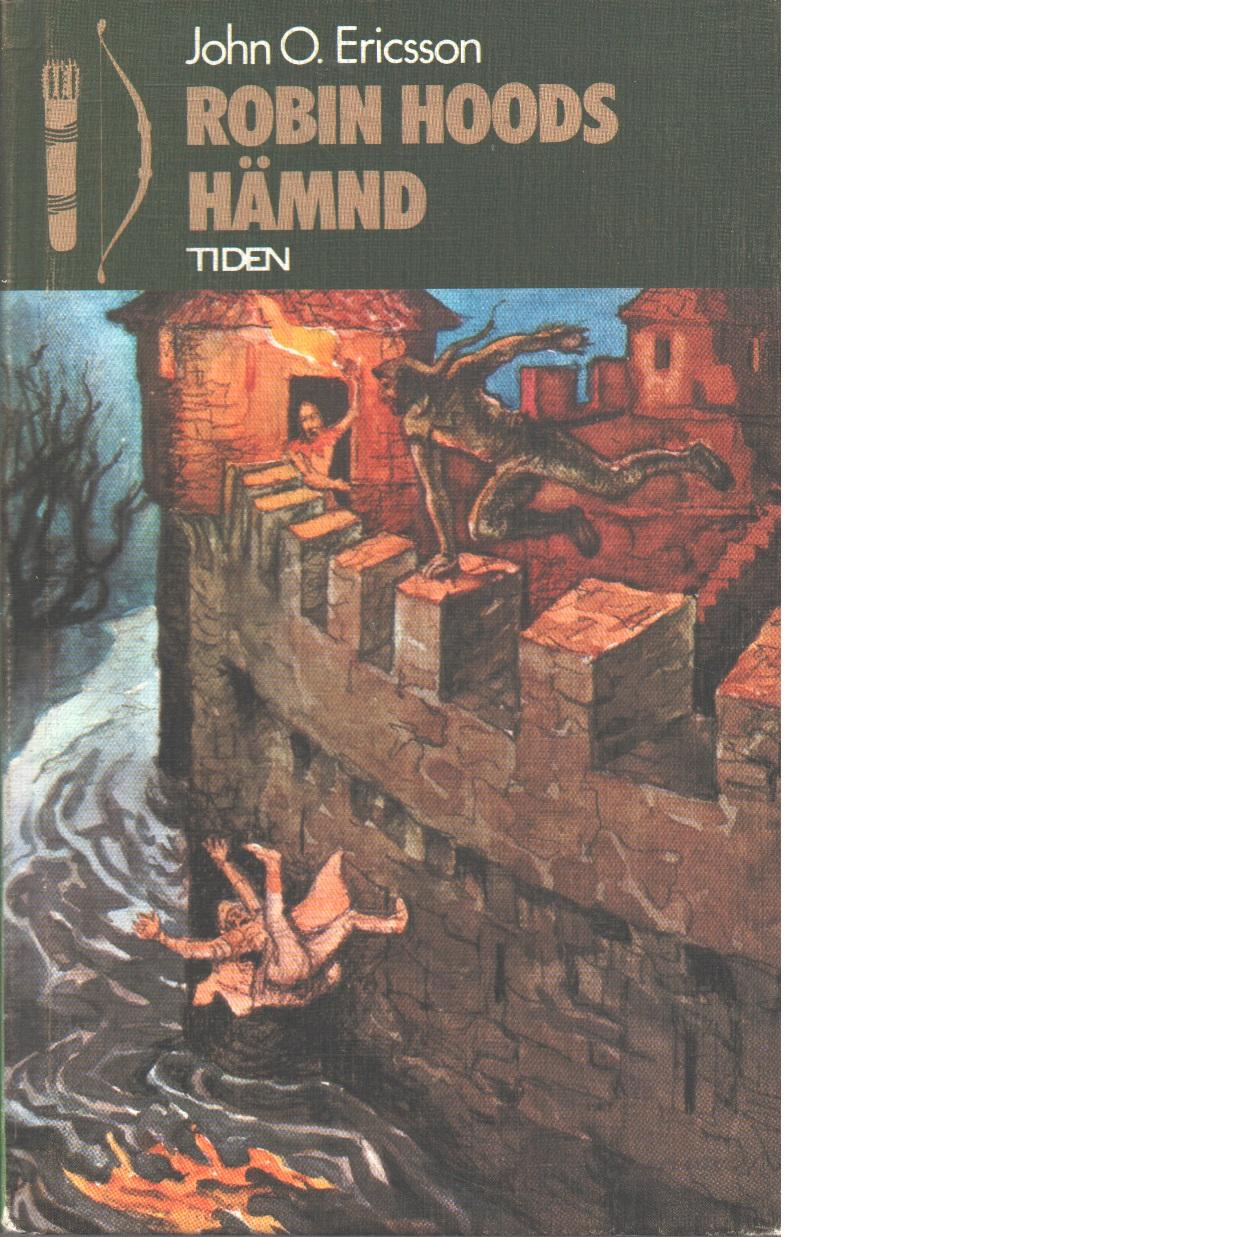 Robin Hoods hämnd - Ericsson, John O.